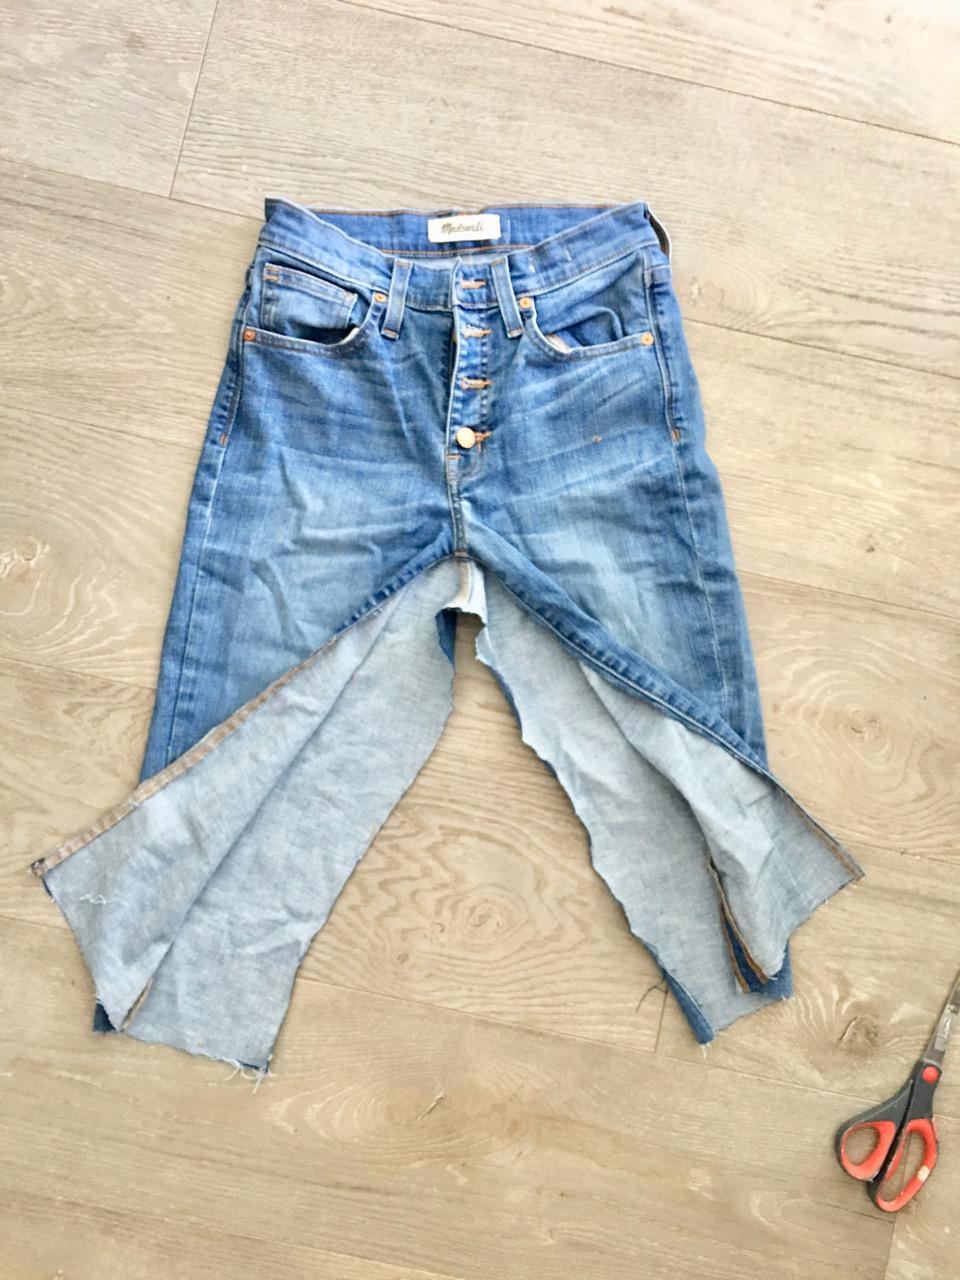 how to make a diy denim mini midi or maxi skirt like Kendall jenner's